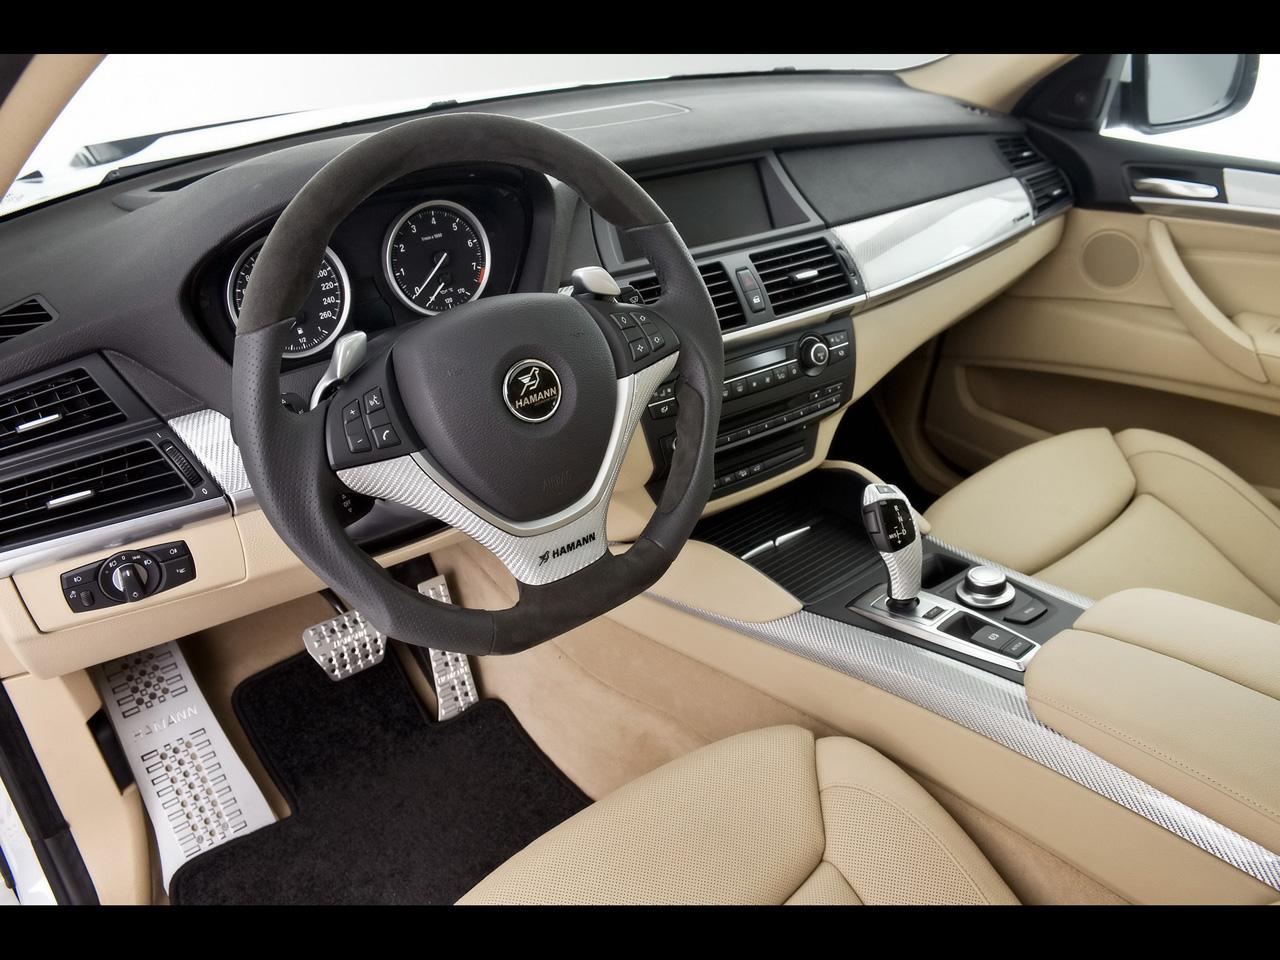 http://1.bp.blogspot.com/-fnkujvjkCeY/Th2pewbE0bI/AAAAAAAAMW8/tl6yGZ3EzF8/s1600/BMW-X6-Dashboard-2010_72.jpg